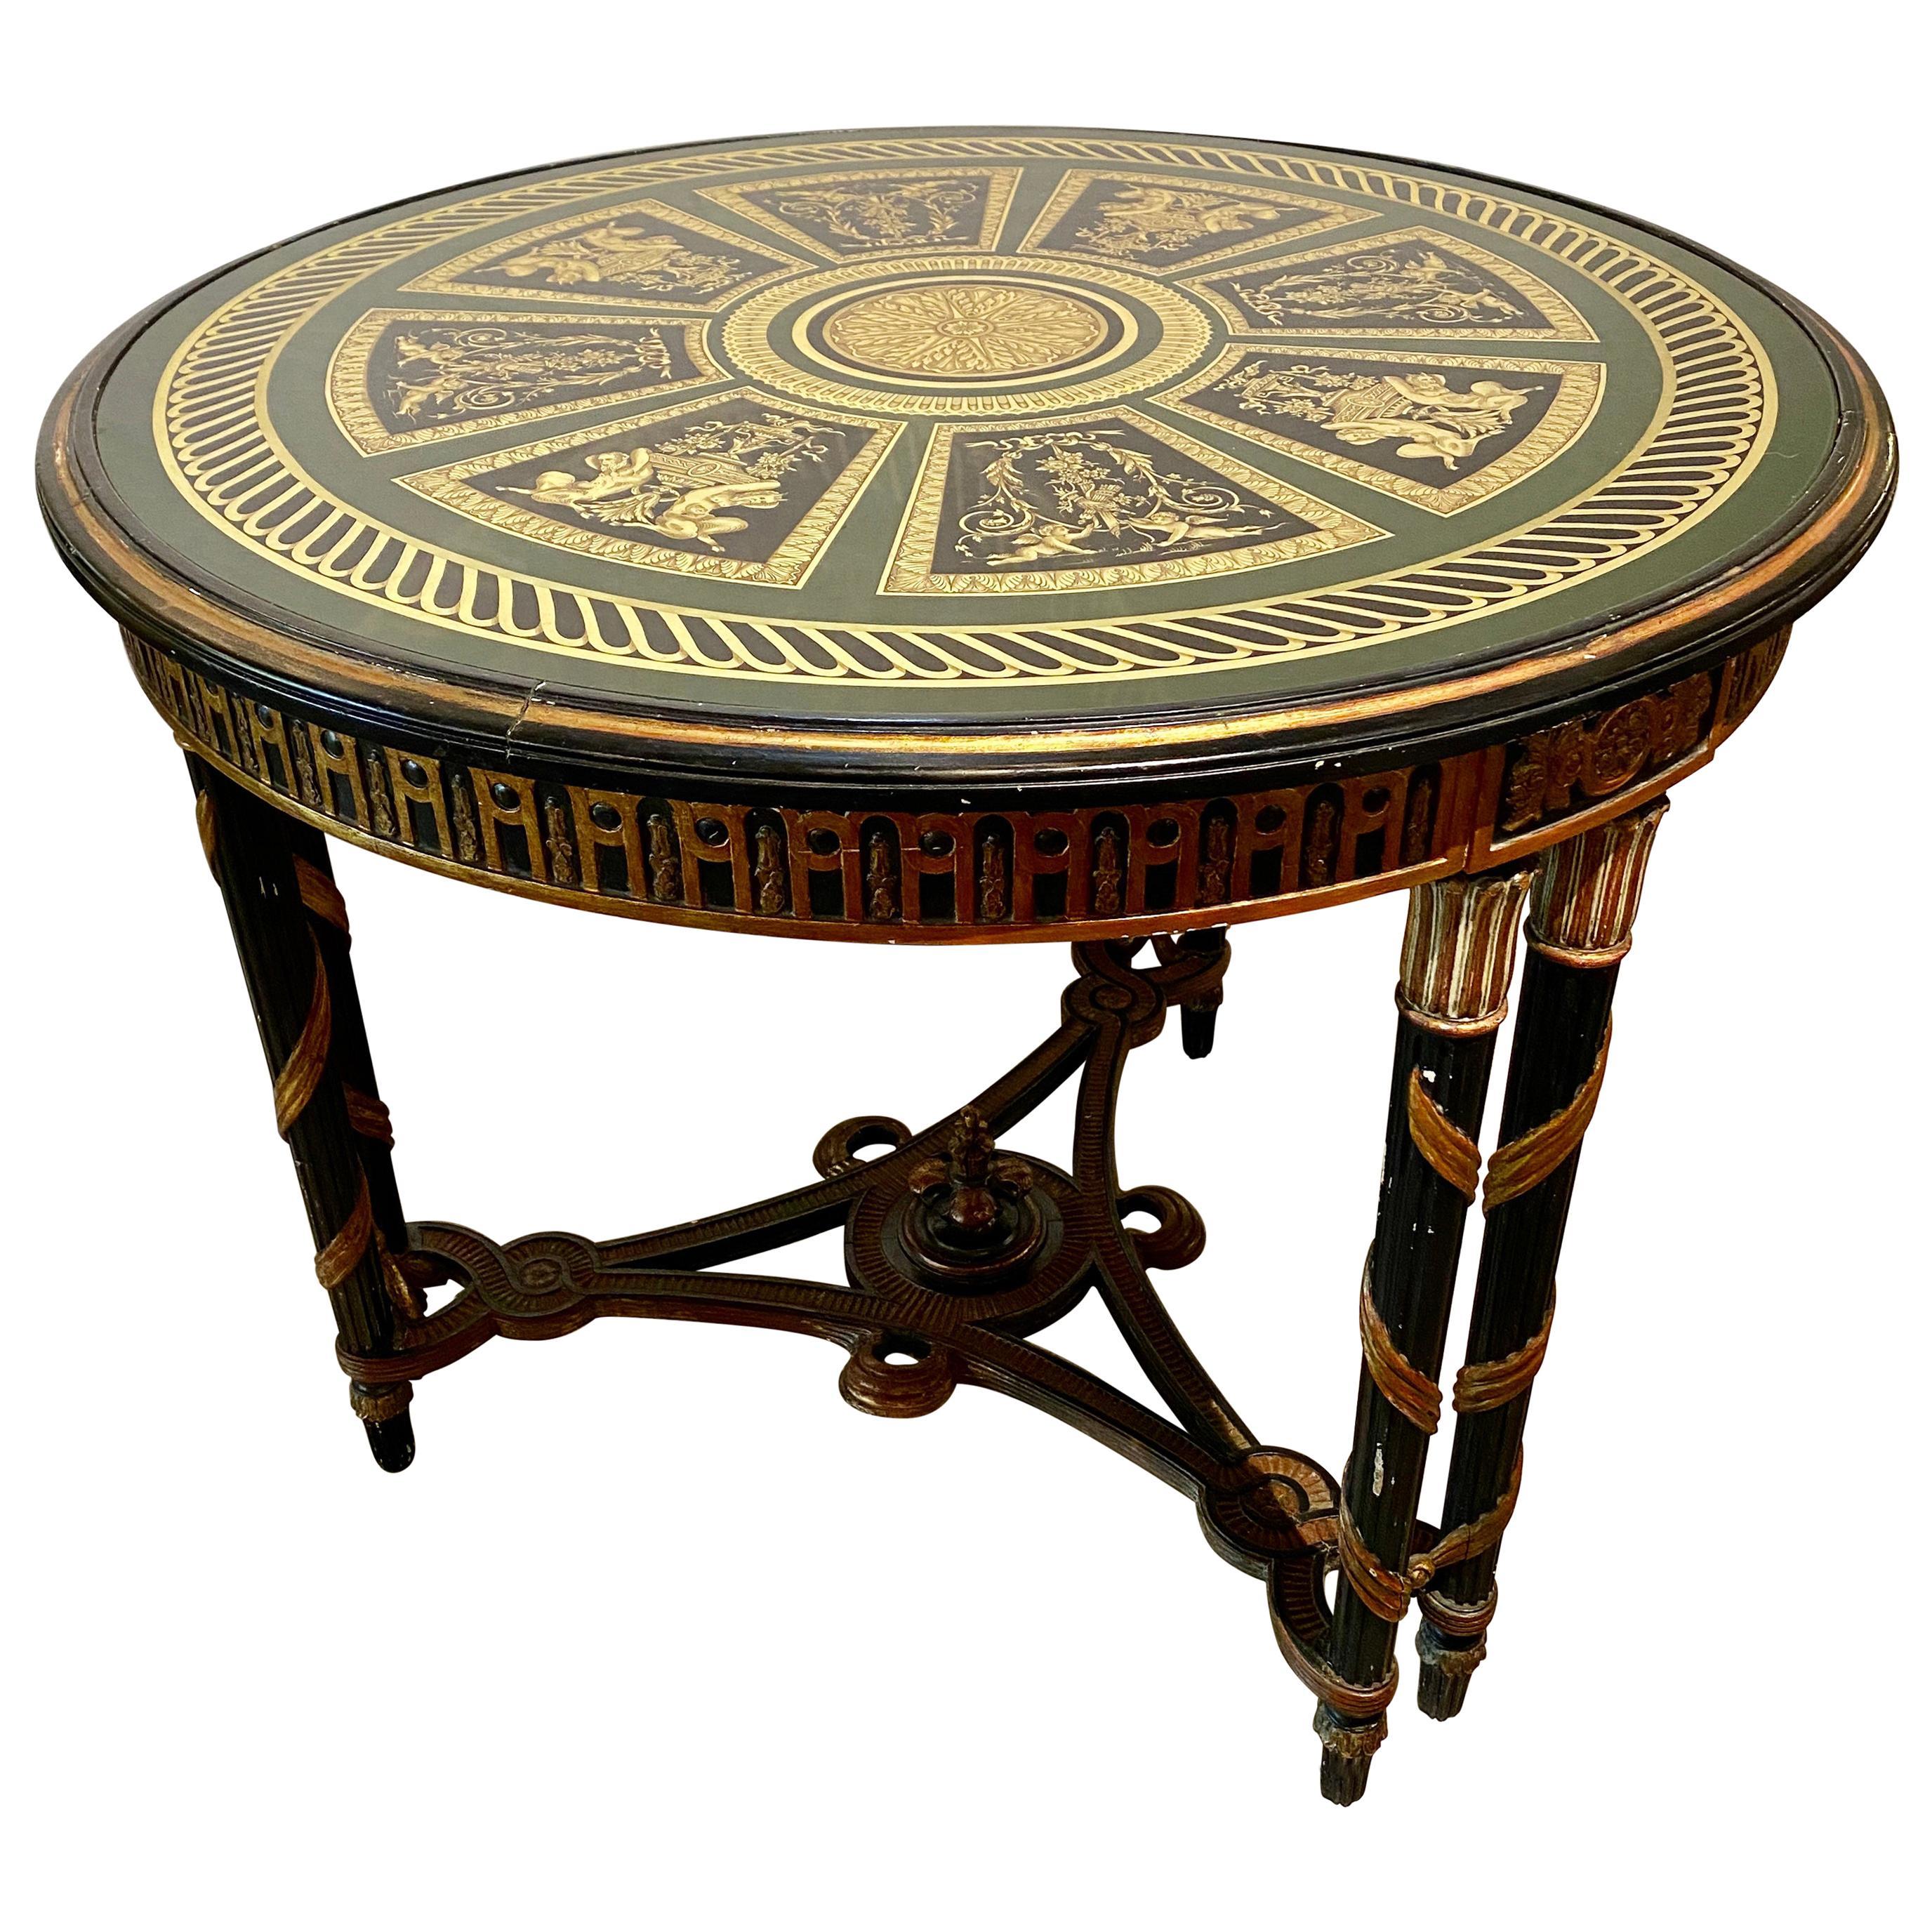 Hollywood Regency French Neoclassical Style Églomisé Center Table, End Table